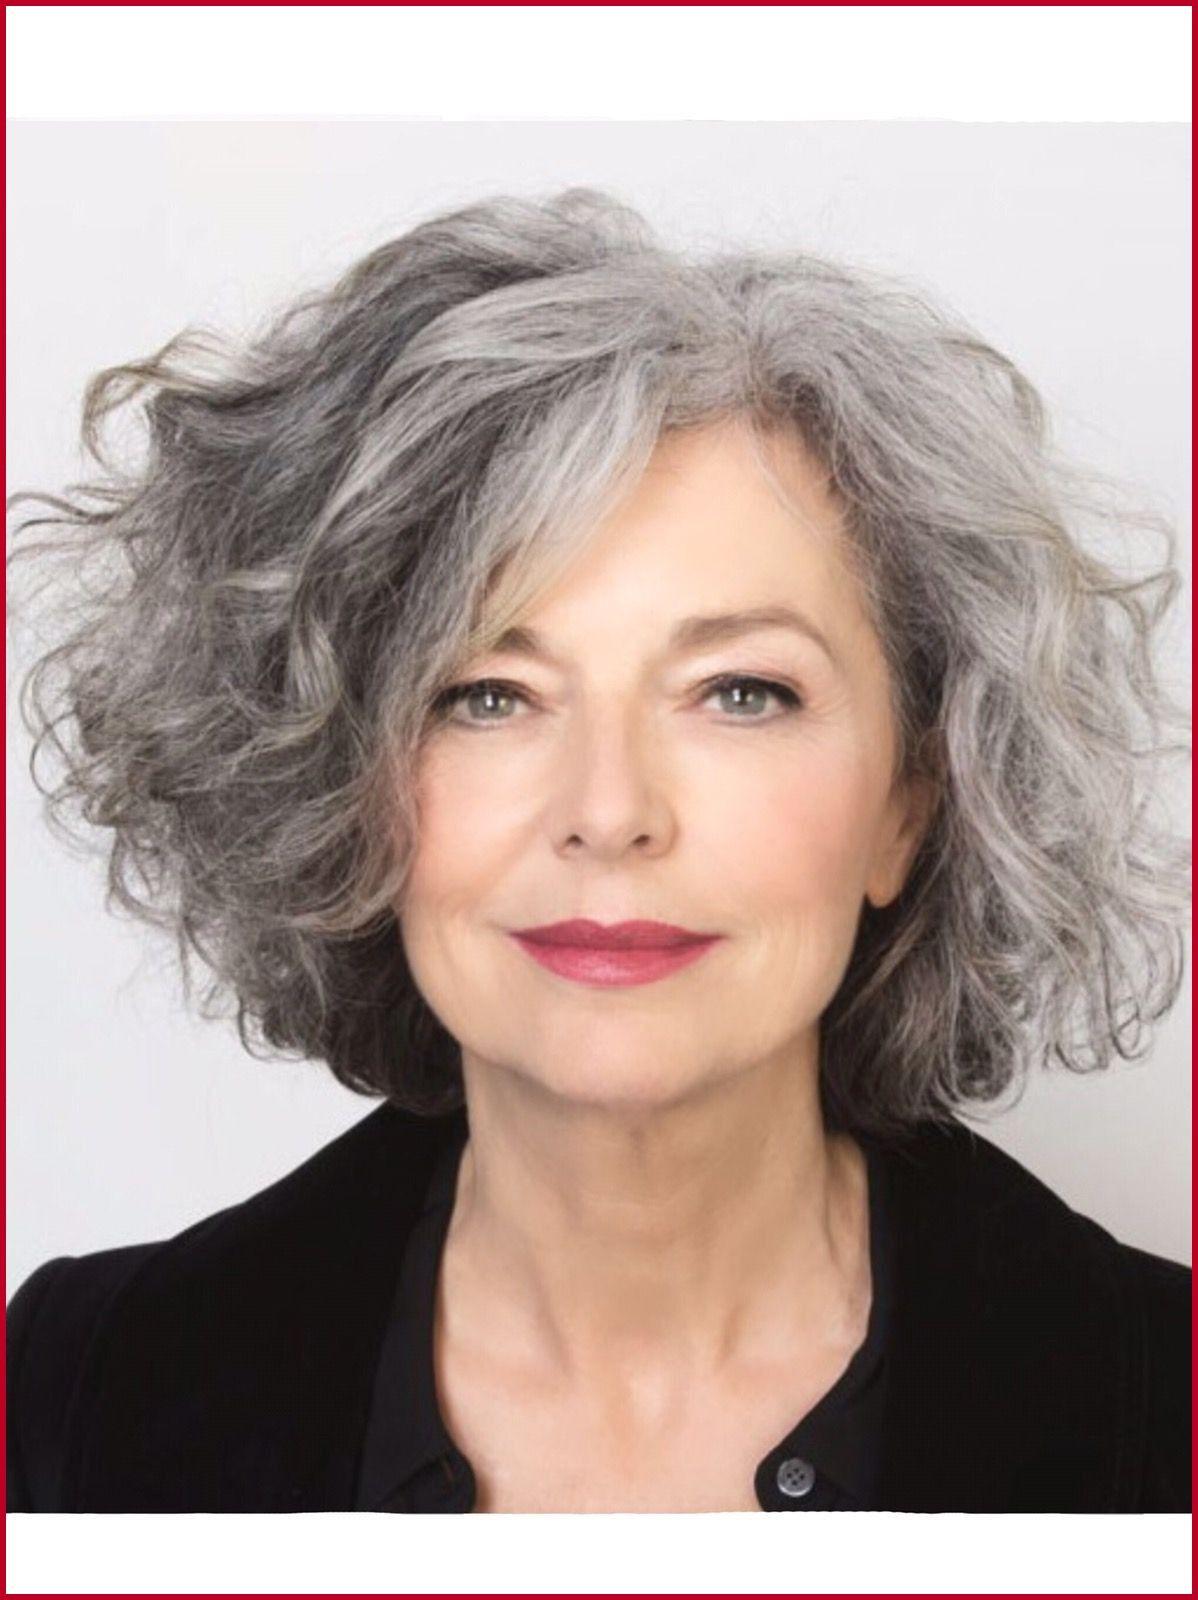 long gray hair on over 12 - Google Search  Hair styles, Medium